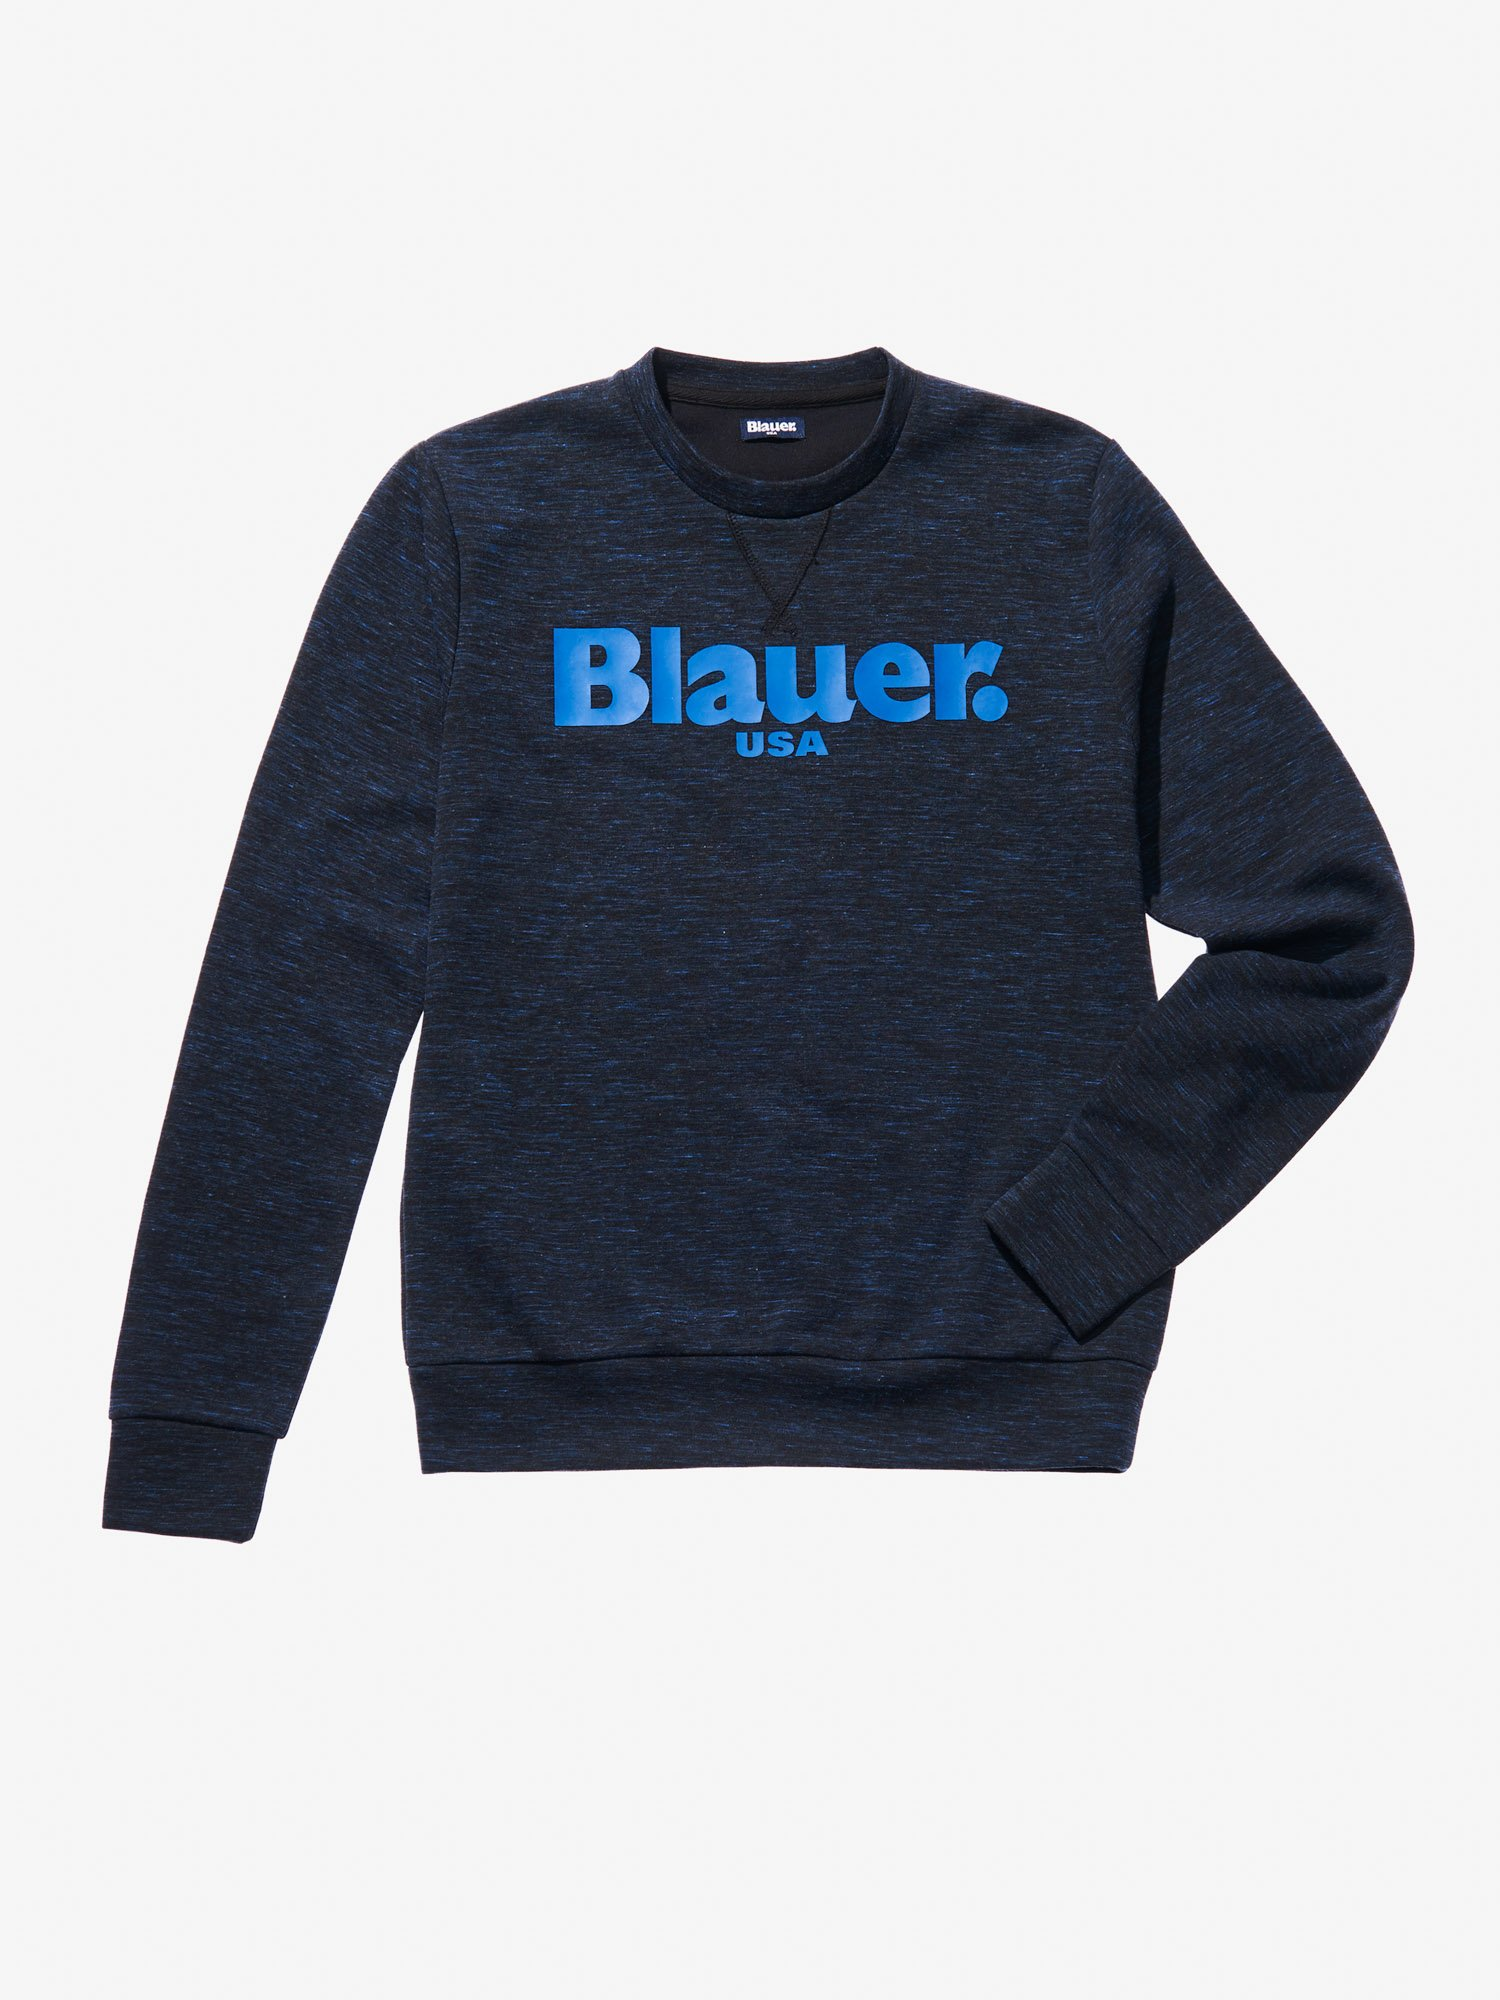 SLUB CREW NECK SWEATSHIRT - Blauer